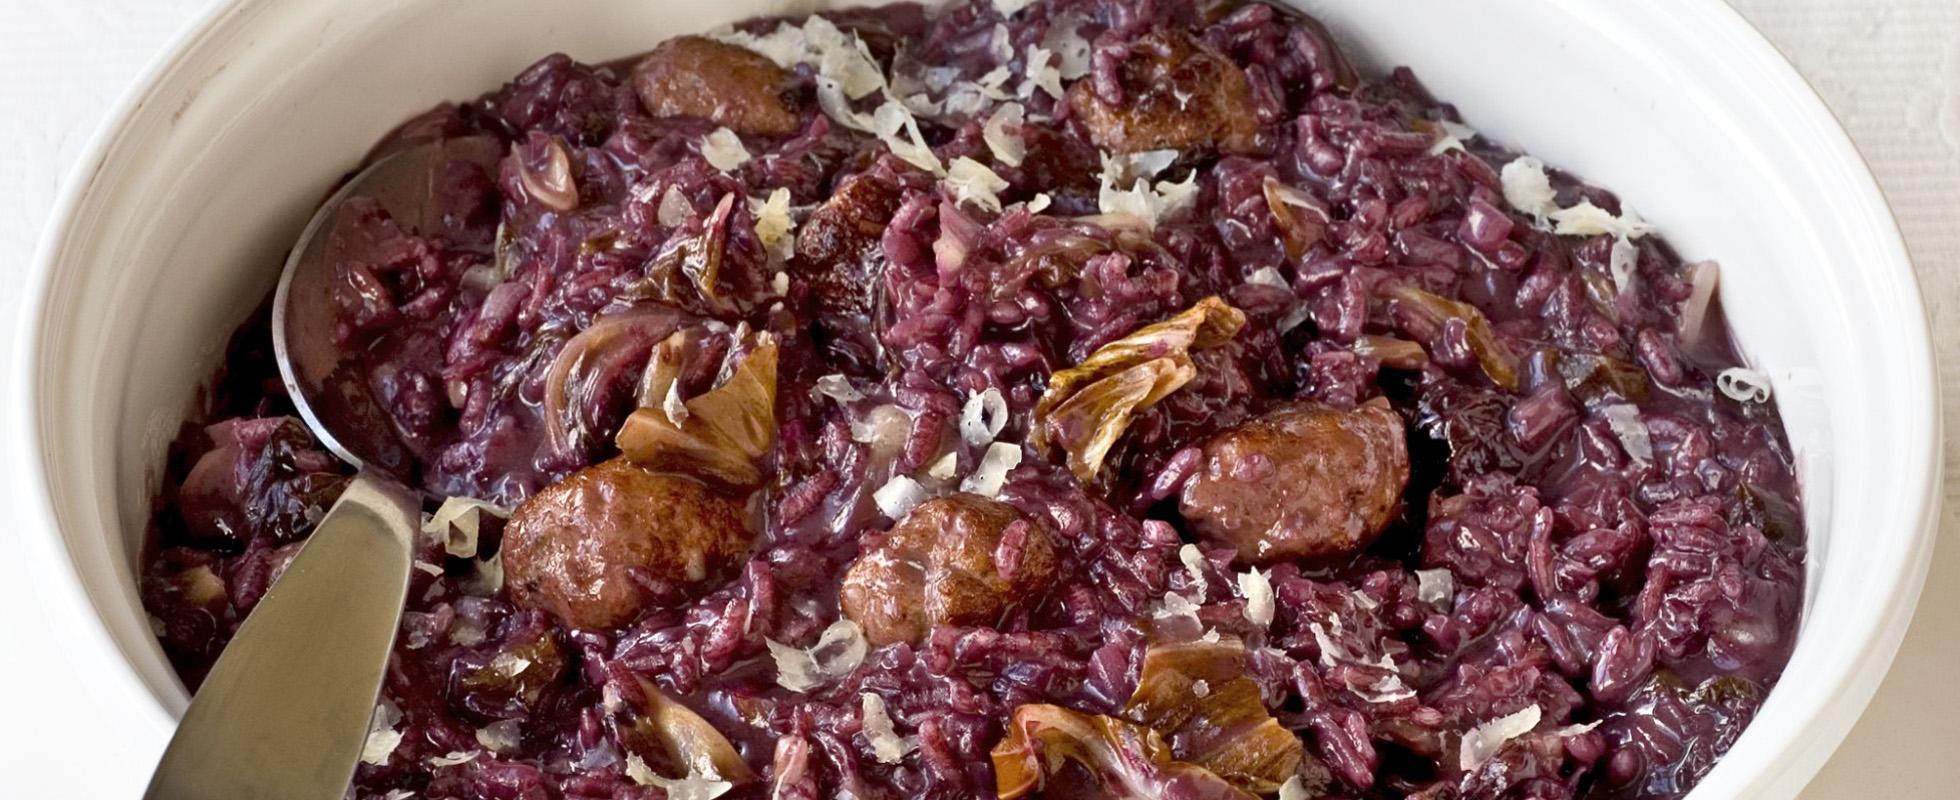 Sausage, radicchio and barolo risotto